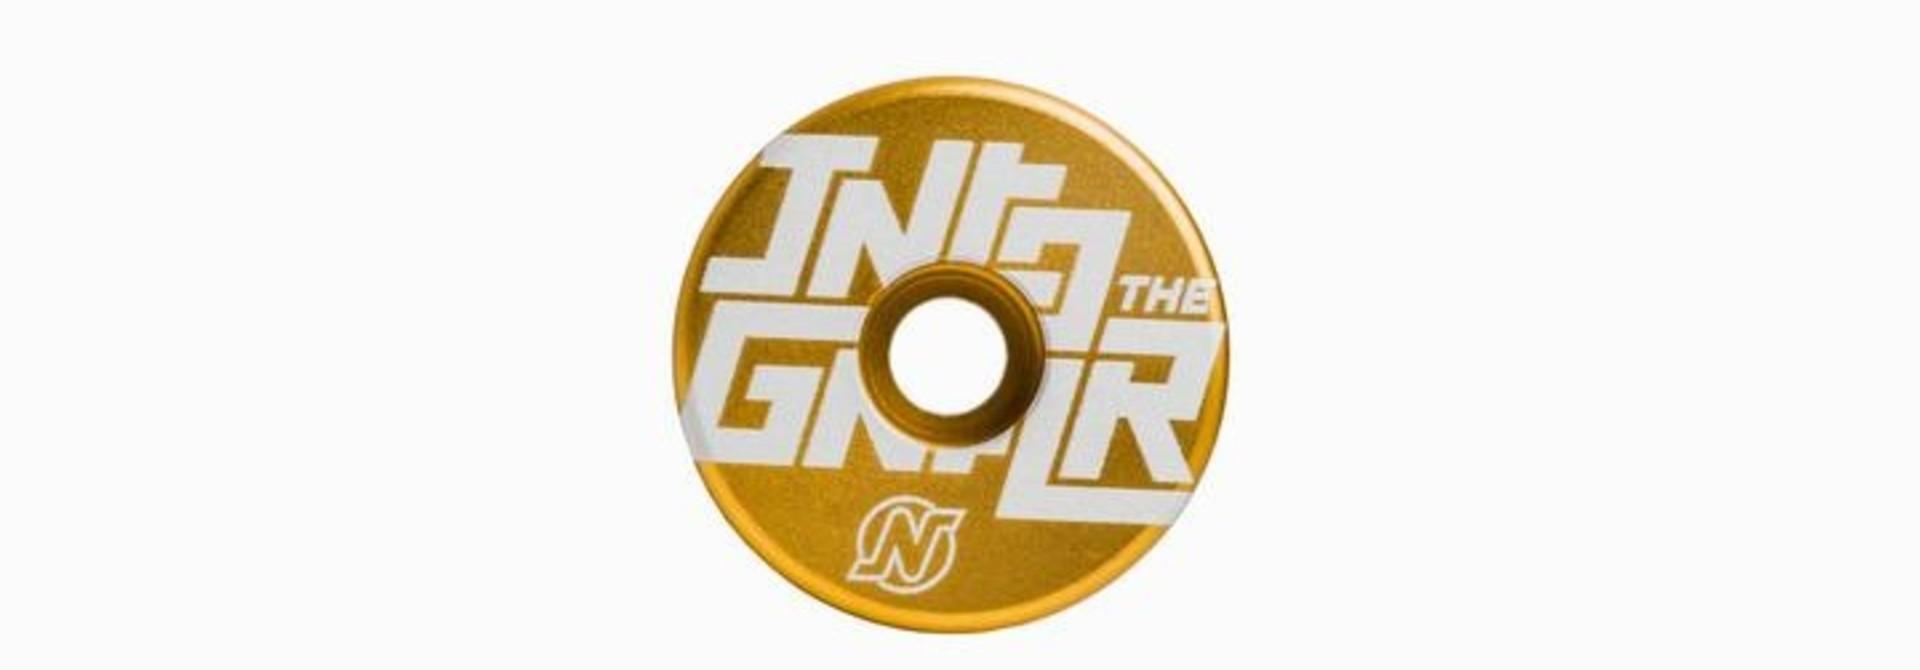 "NSB, Yoann Barelli - Into The Gnar Headset Top Cap 1-1/8"""